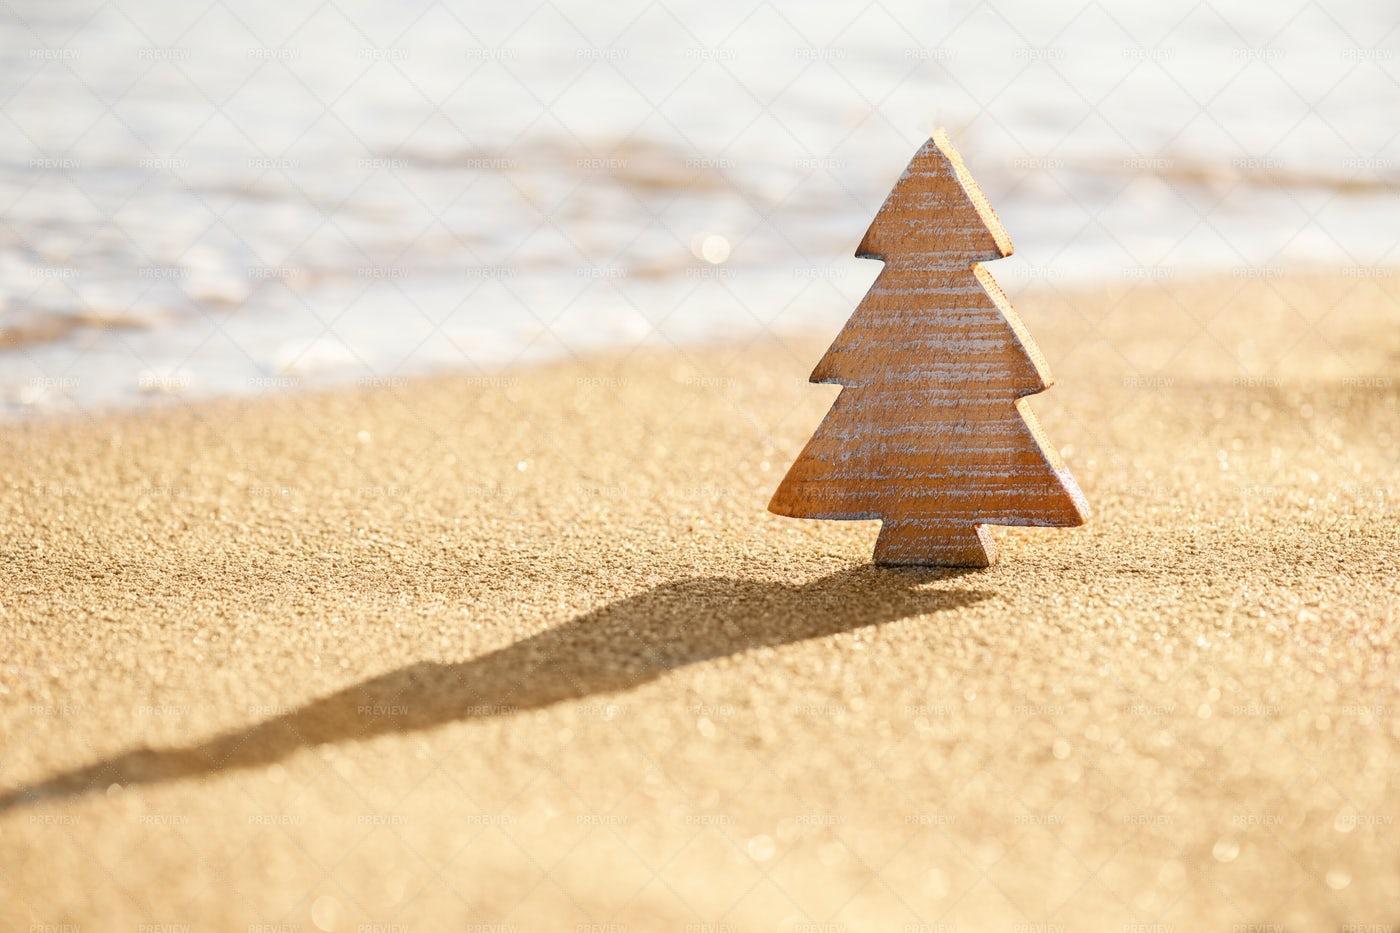 Small Wood Christmas Tree On The Beach: Stock Photos